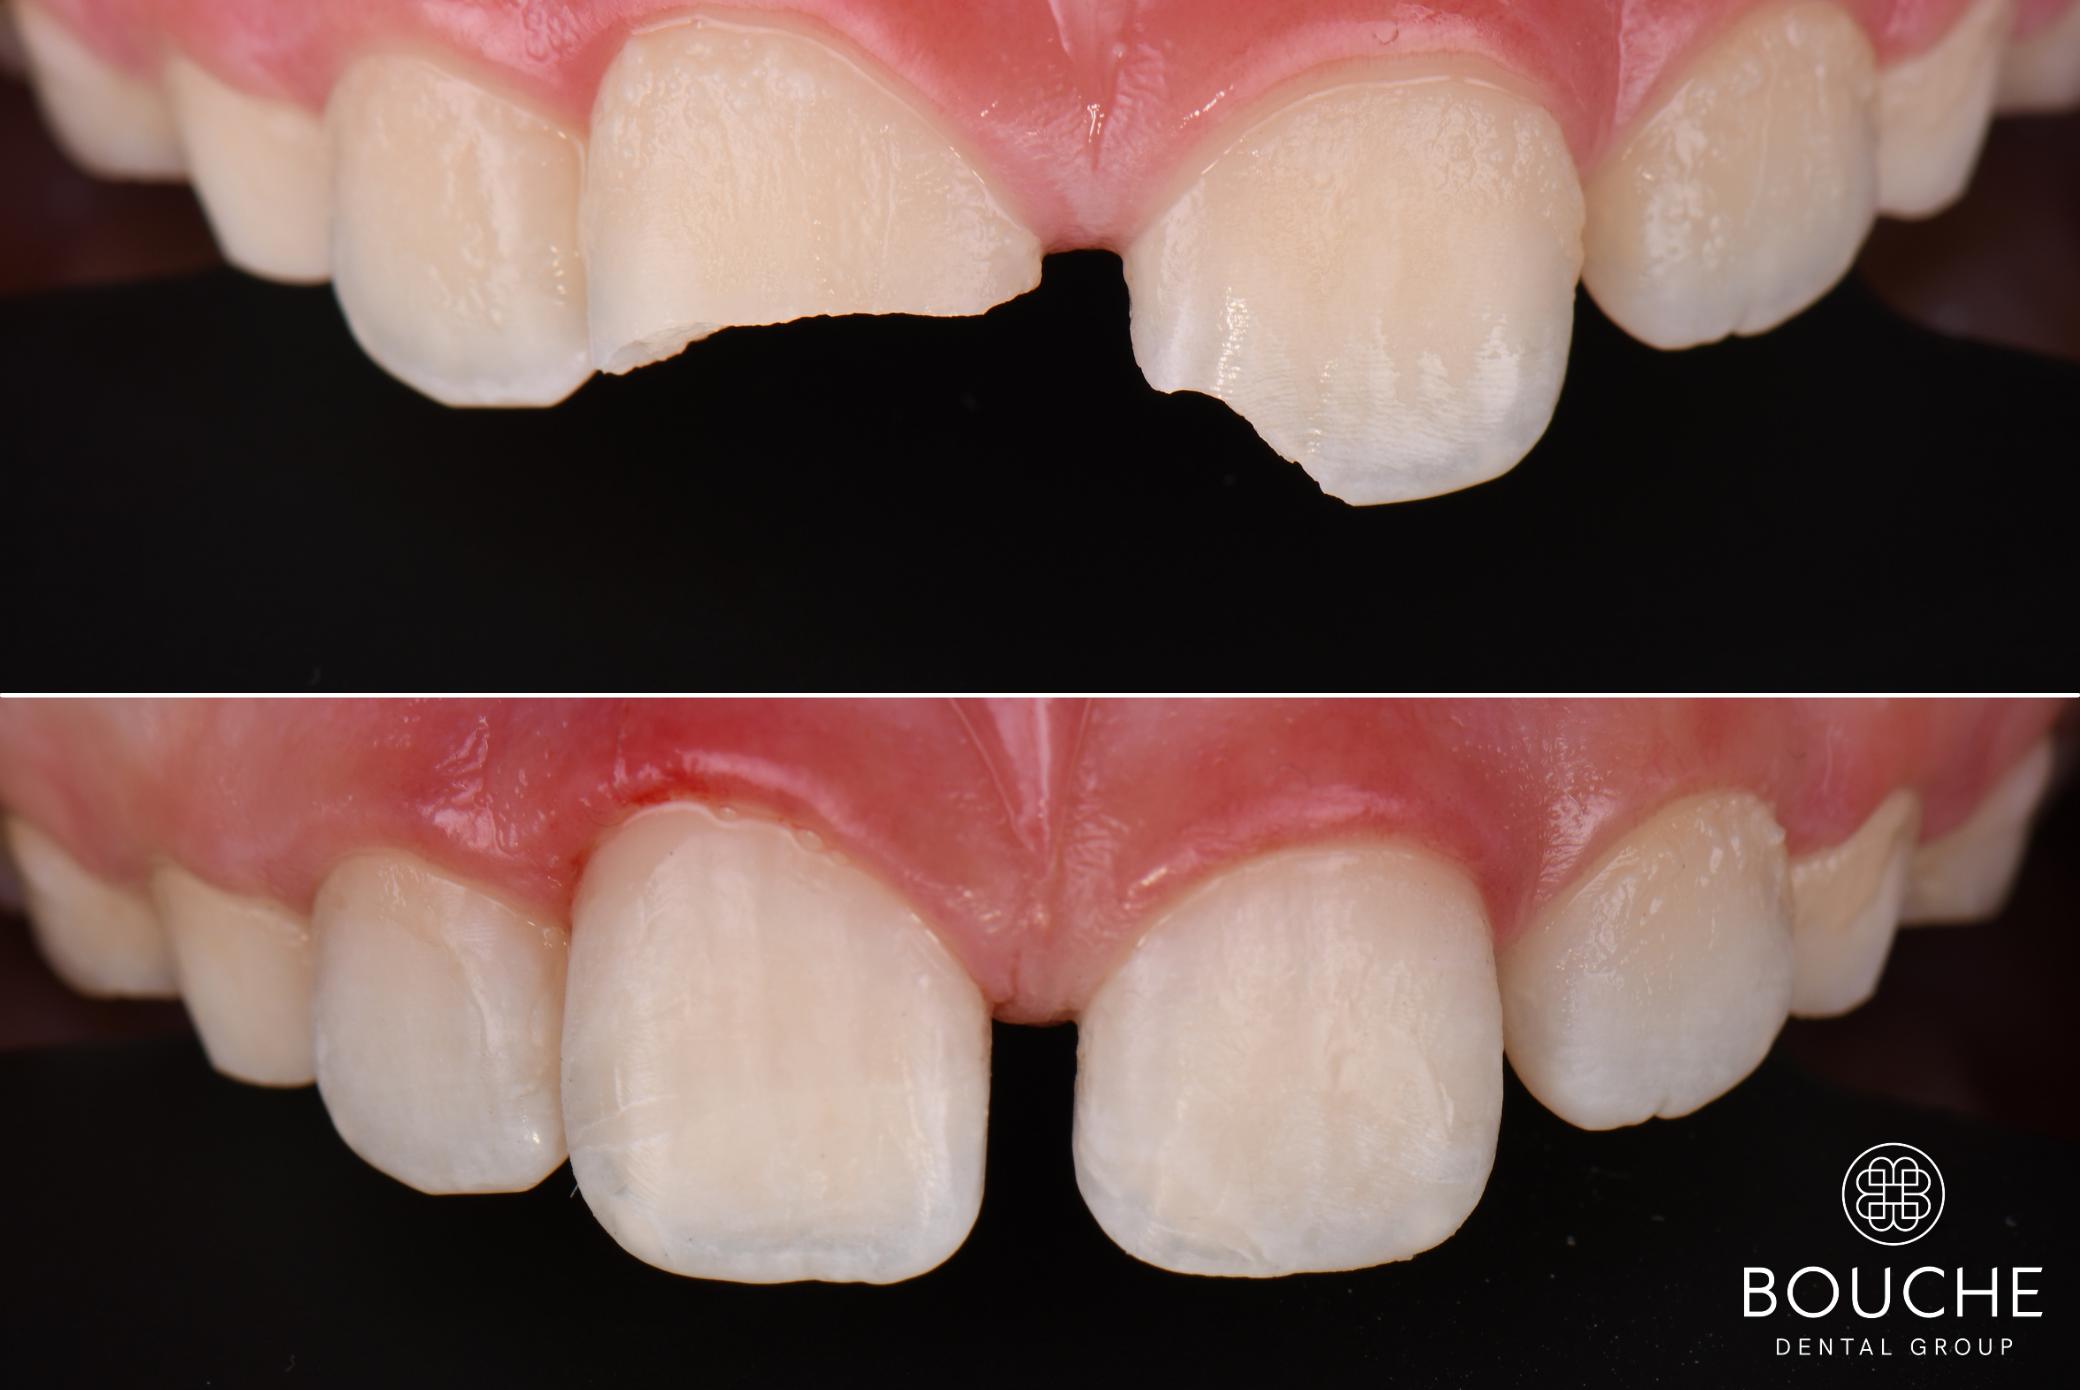 caso clínico traumatismo dentário Luxemburgo